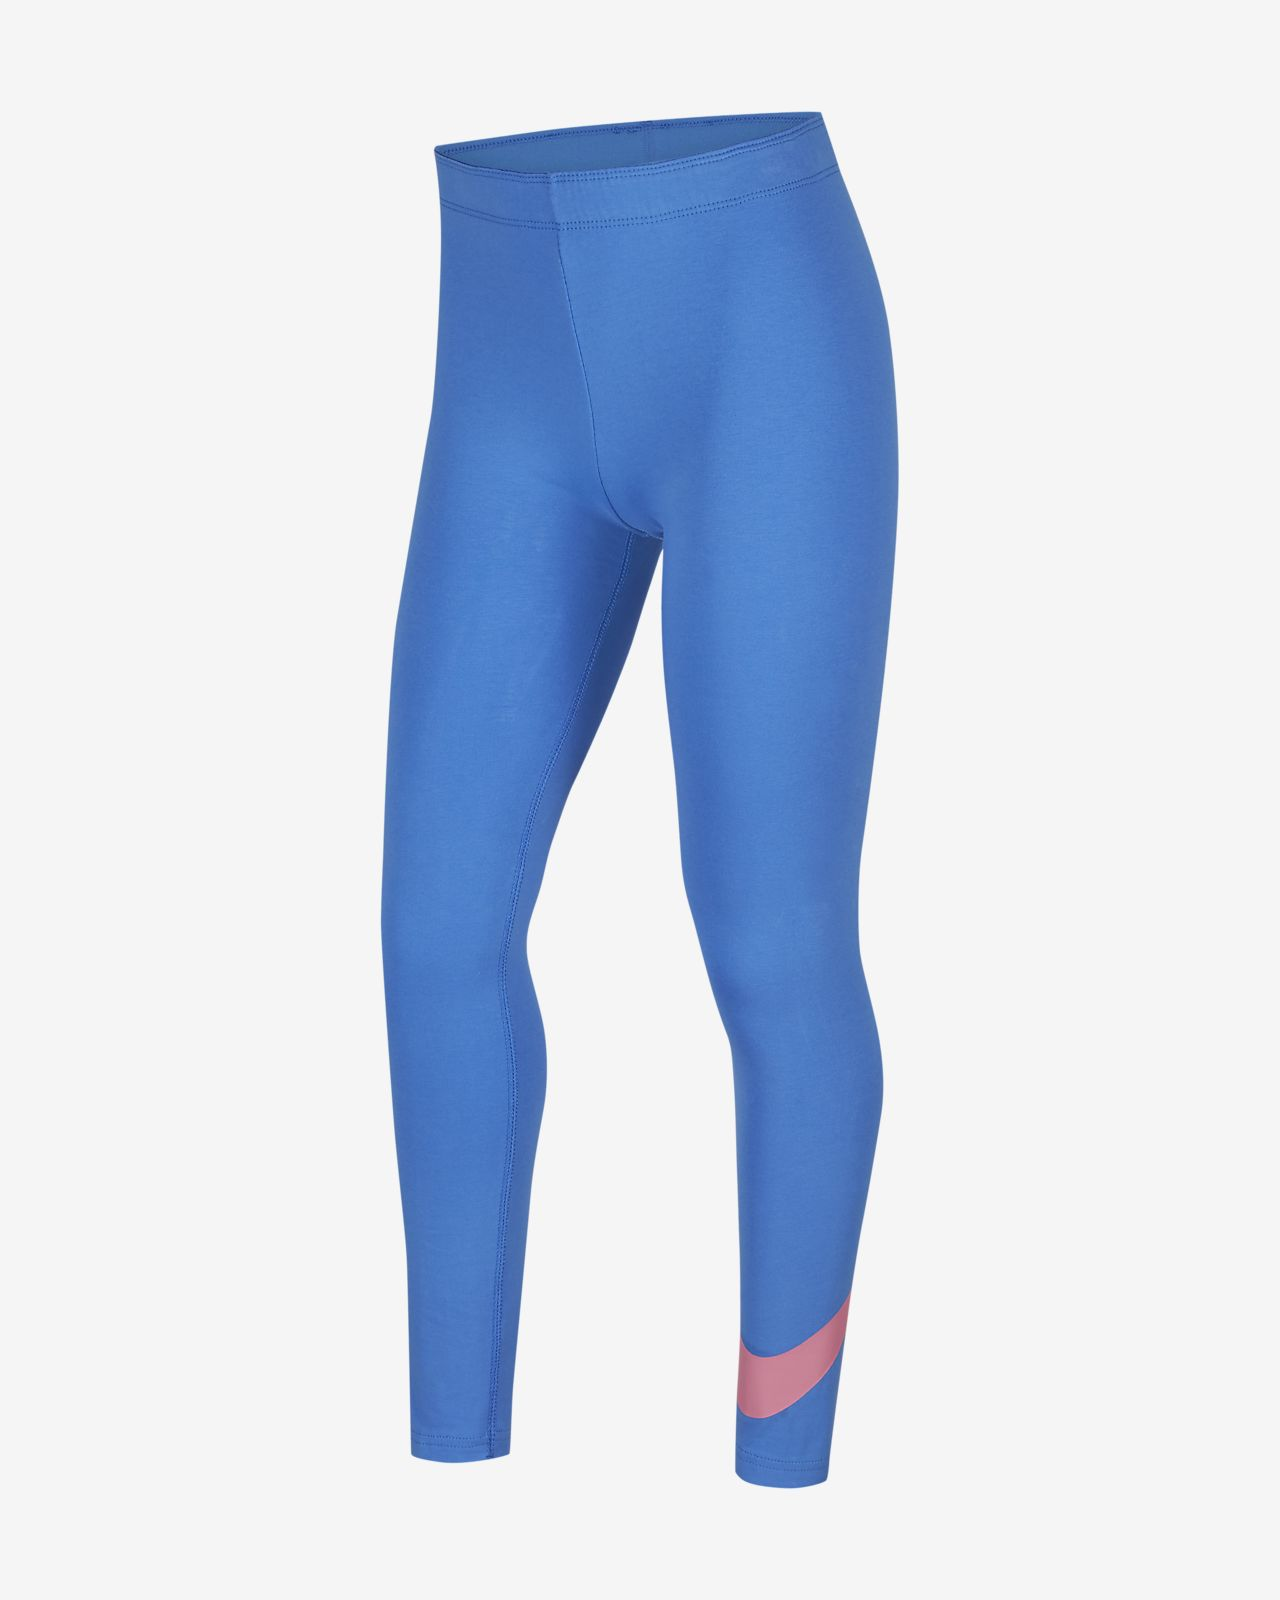 Nike Sportswear Swoosh 大童(女孩)紧身裤